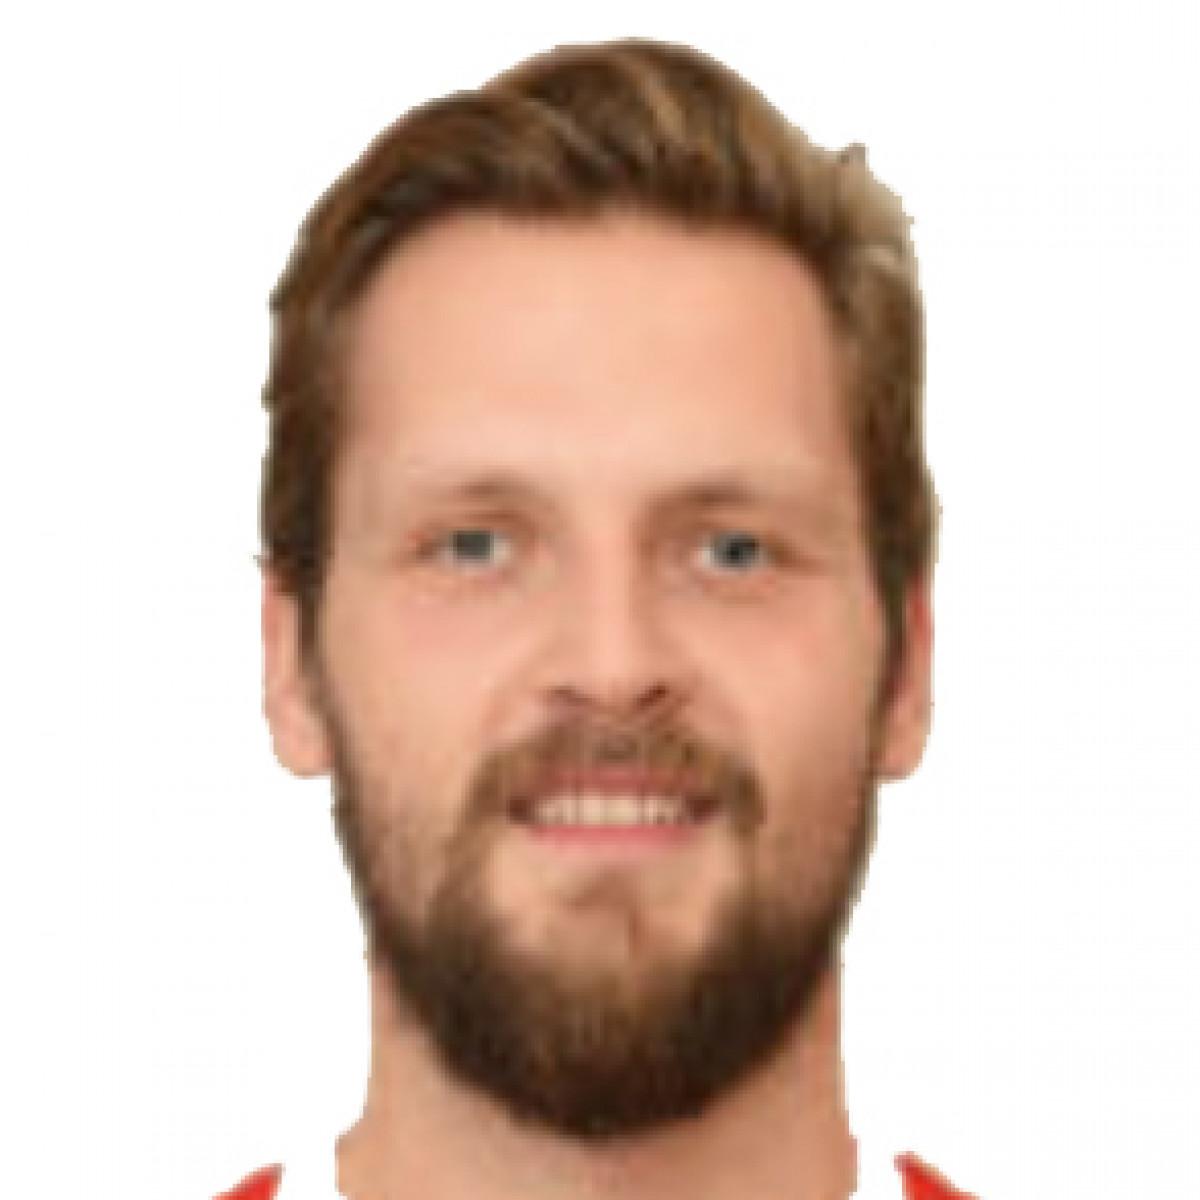 Filip Zekavicic